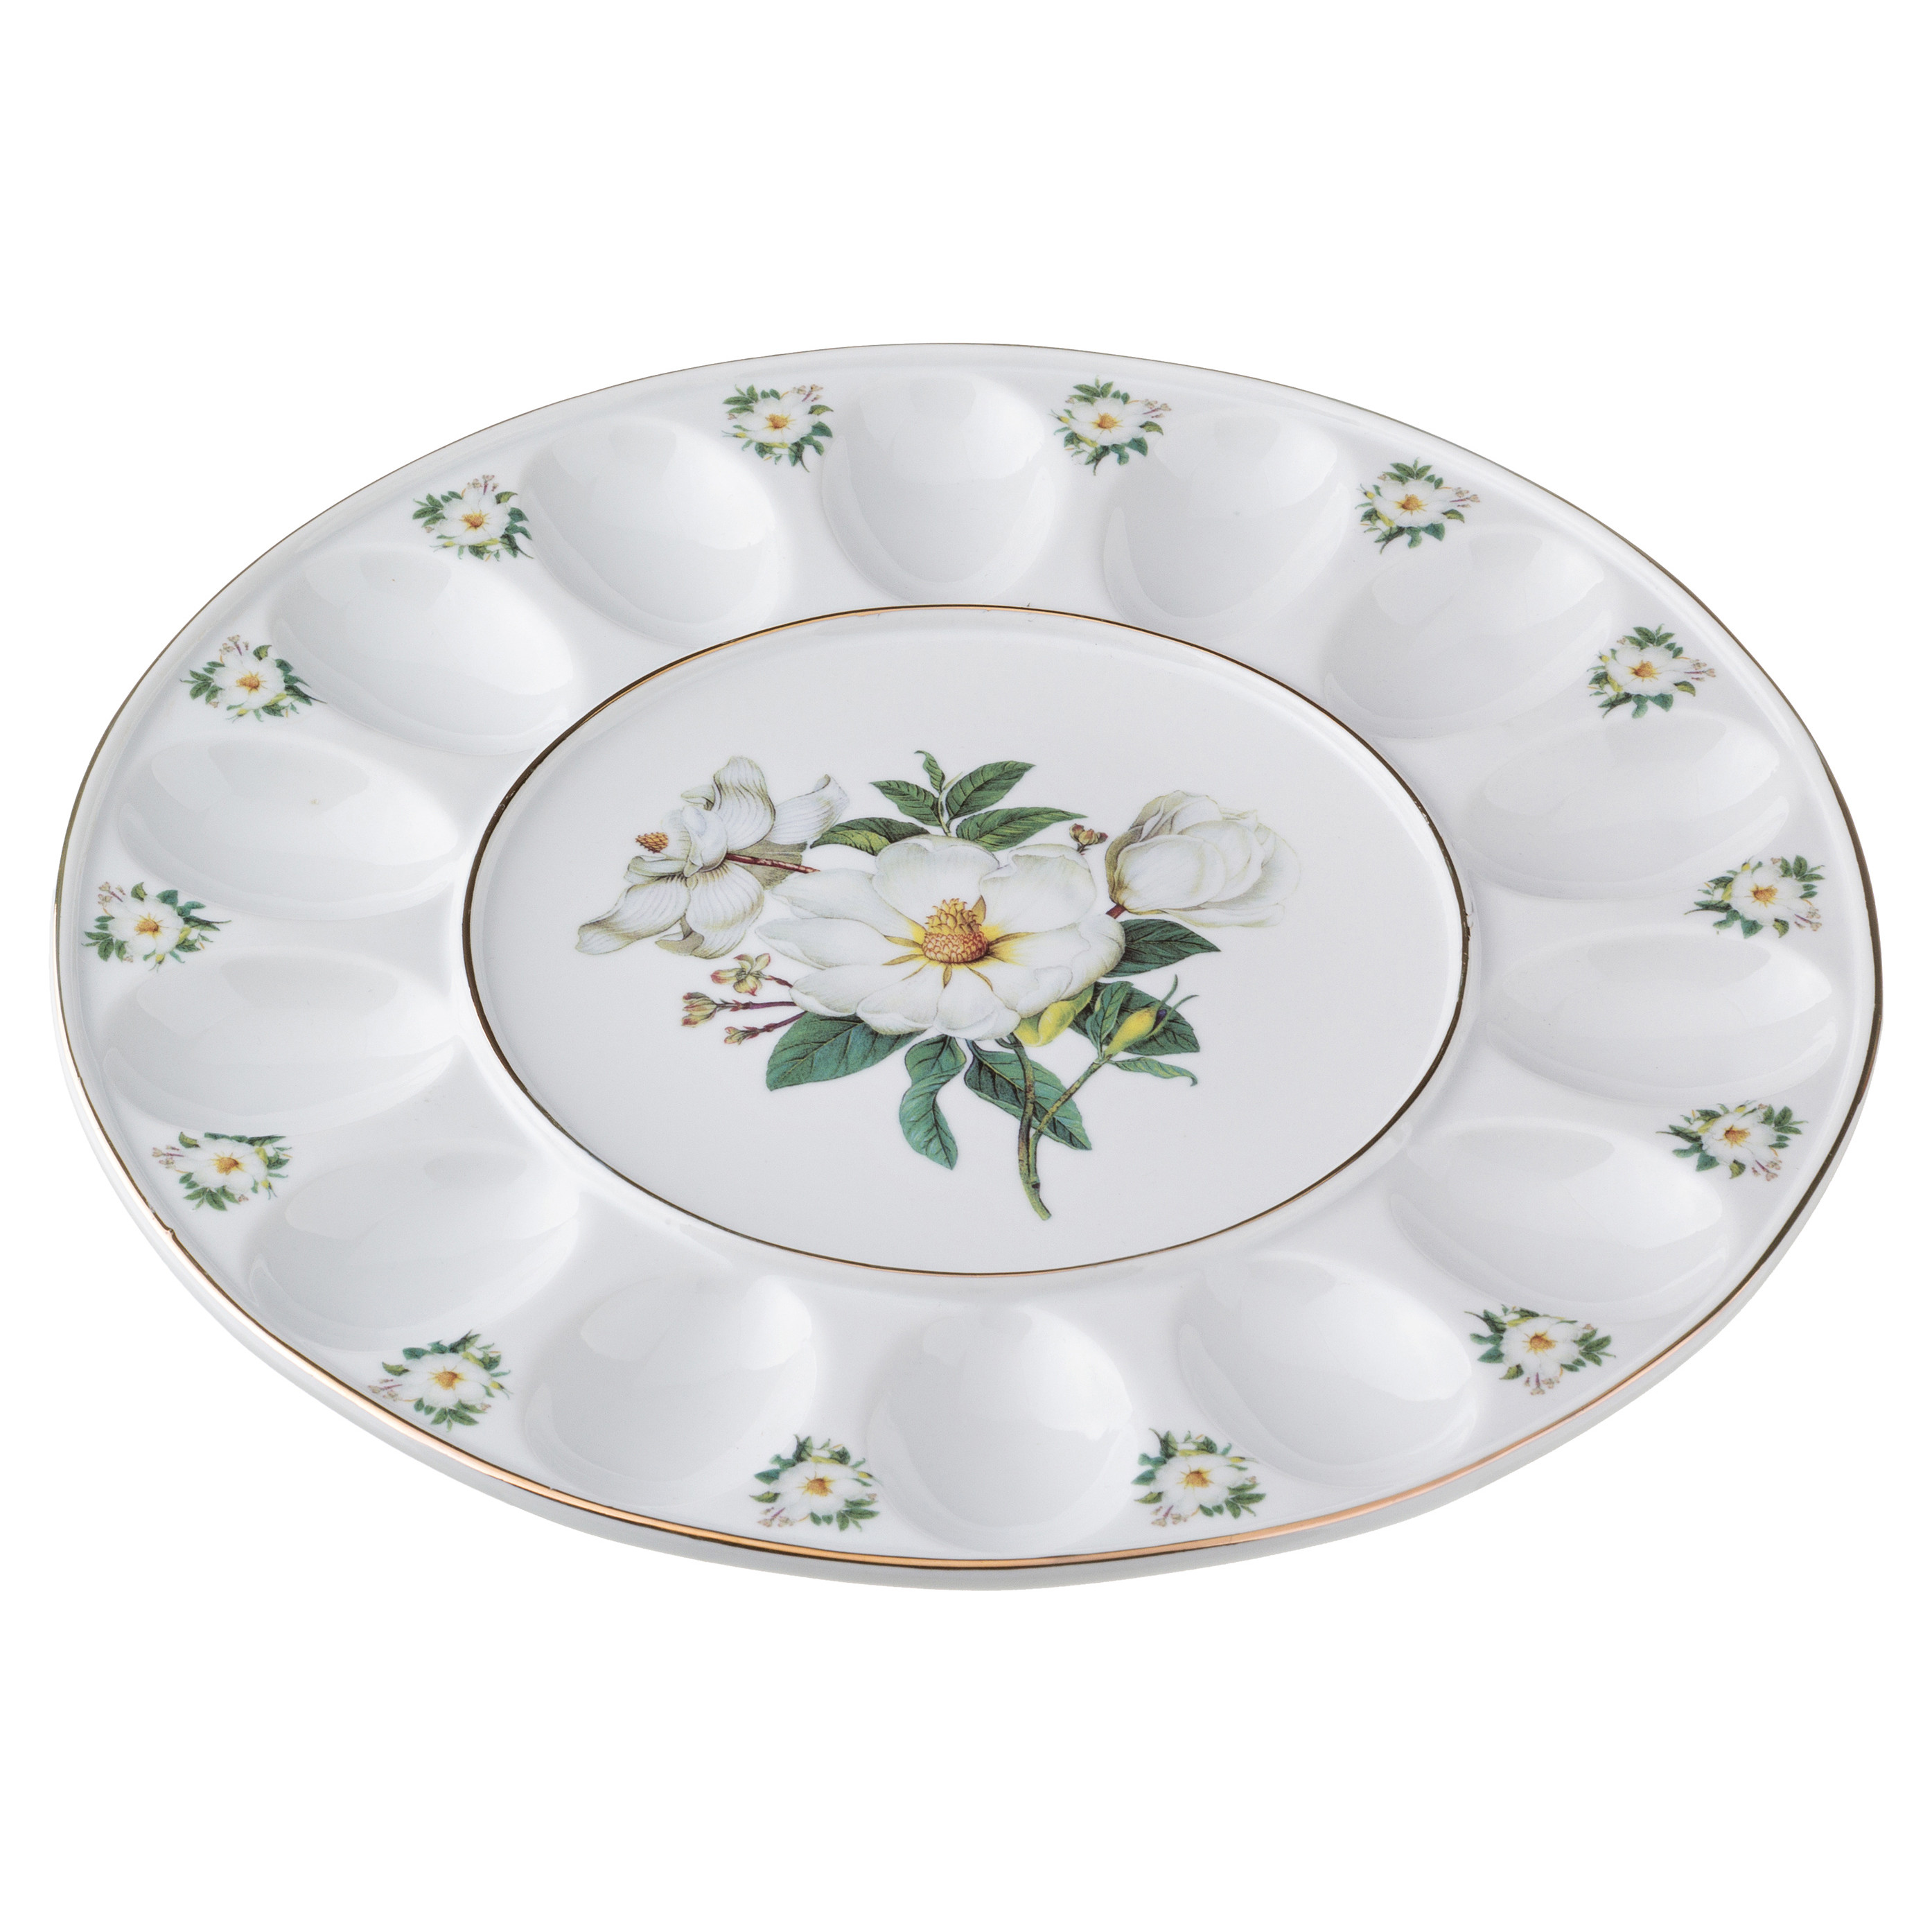 {} Arti-M Тарелка для яиц Белый Шиповник (2х30 см)